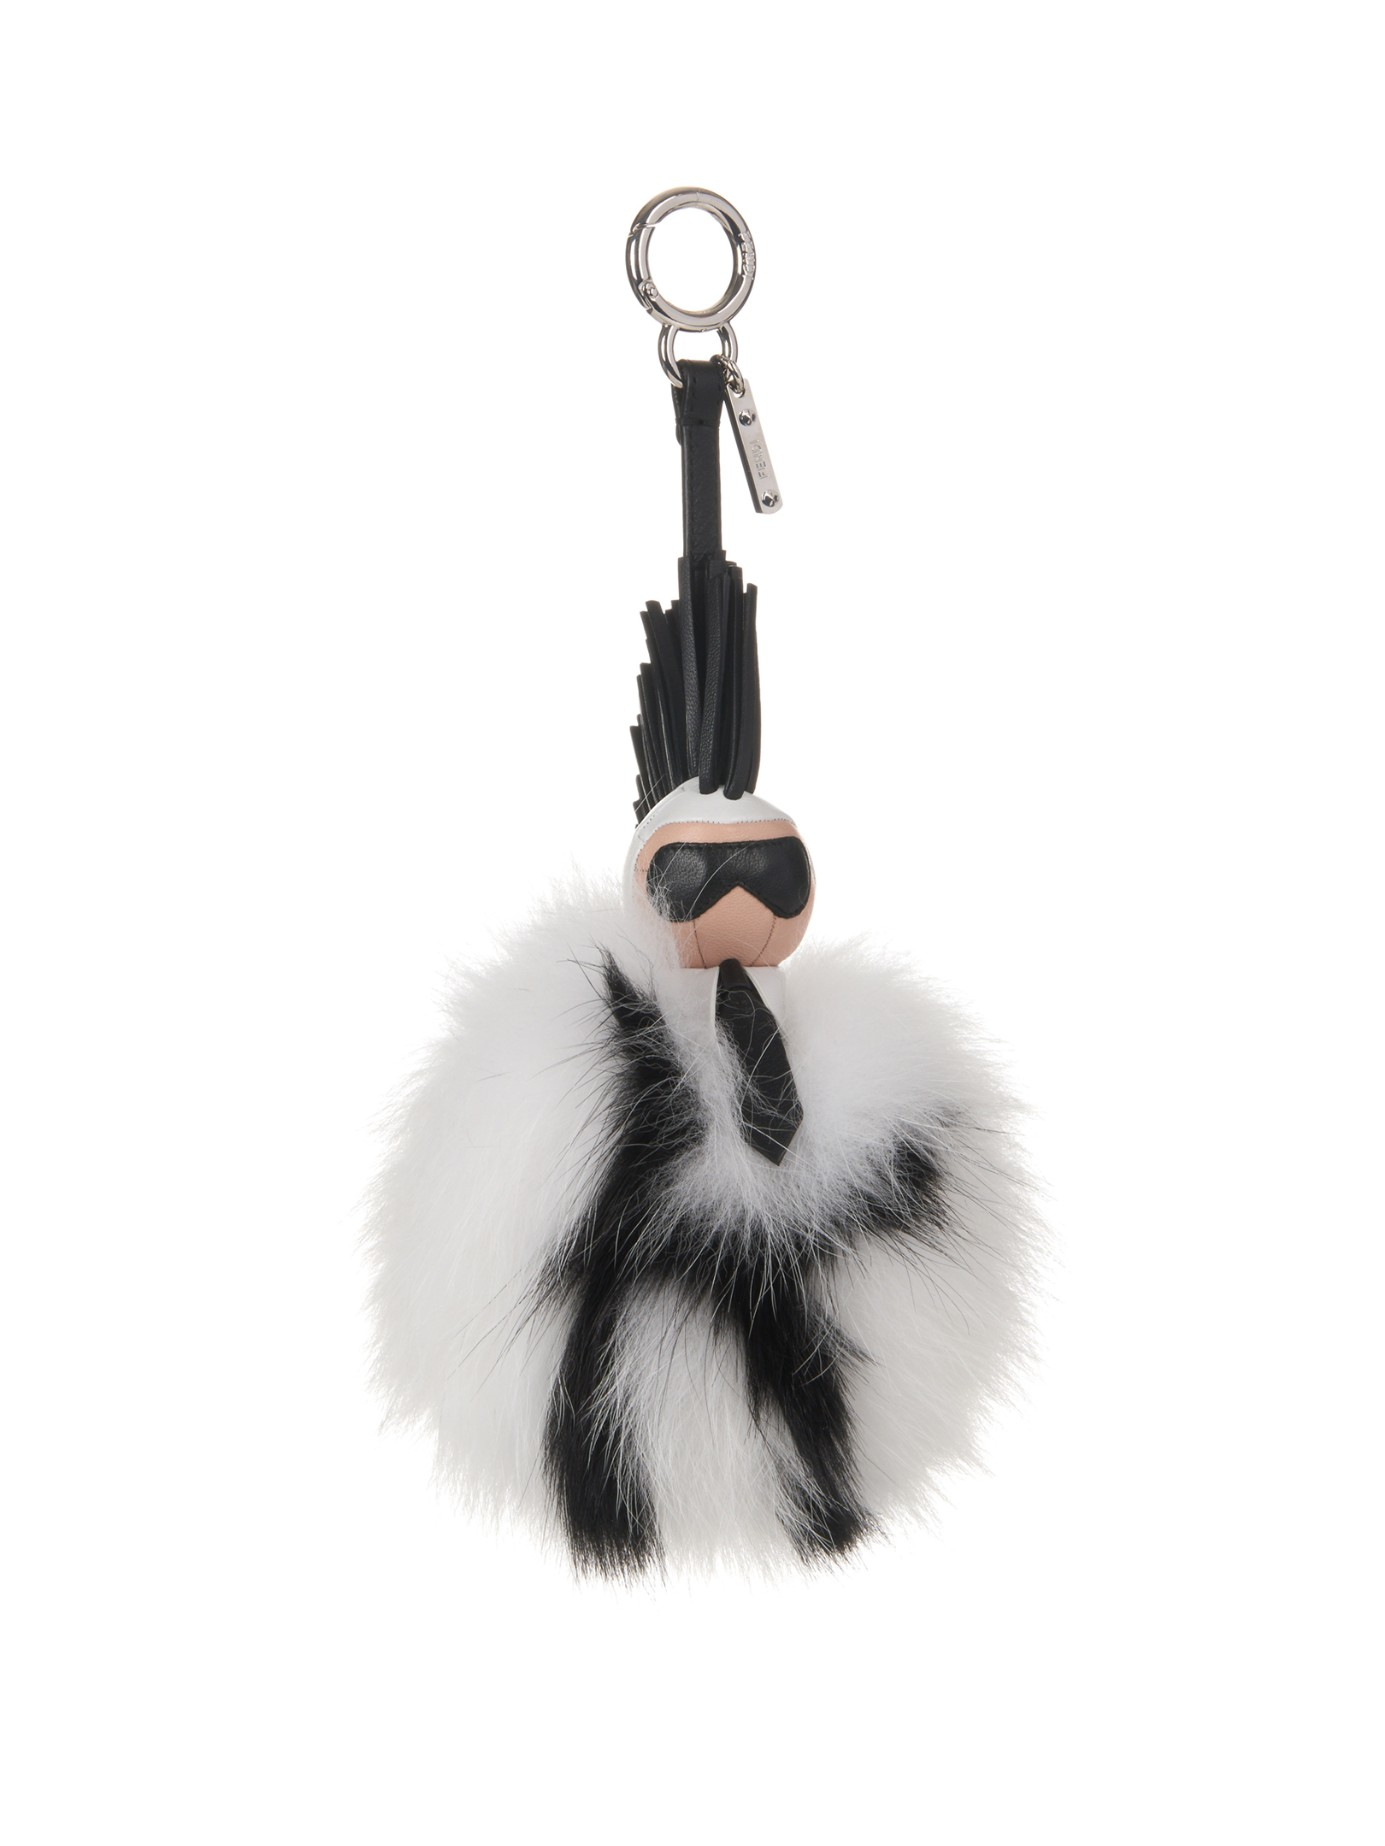 Fendi Pompom bag charm - Black njWpr7PwOp